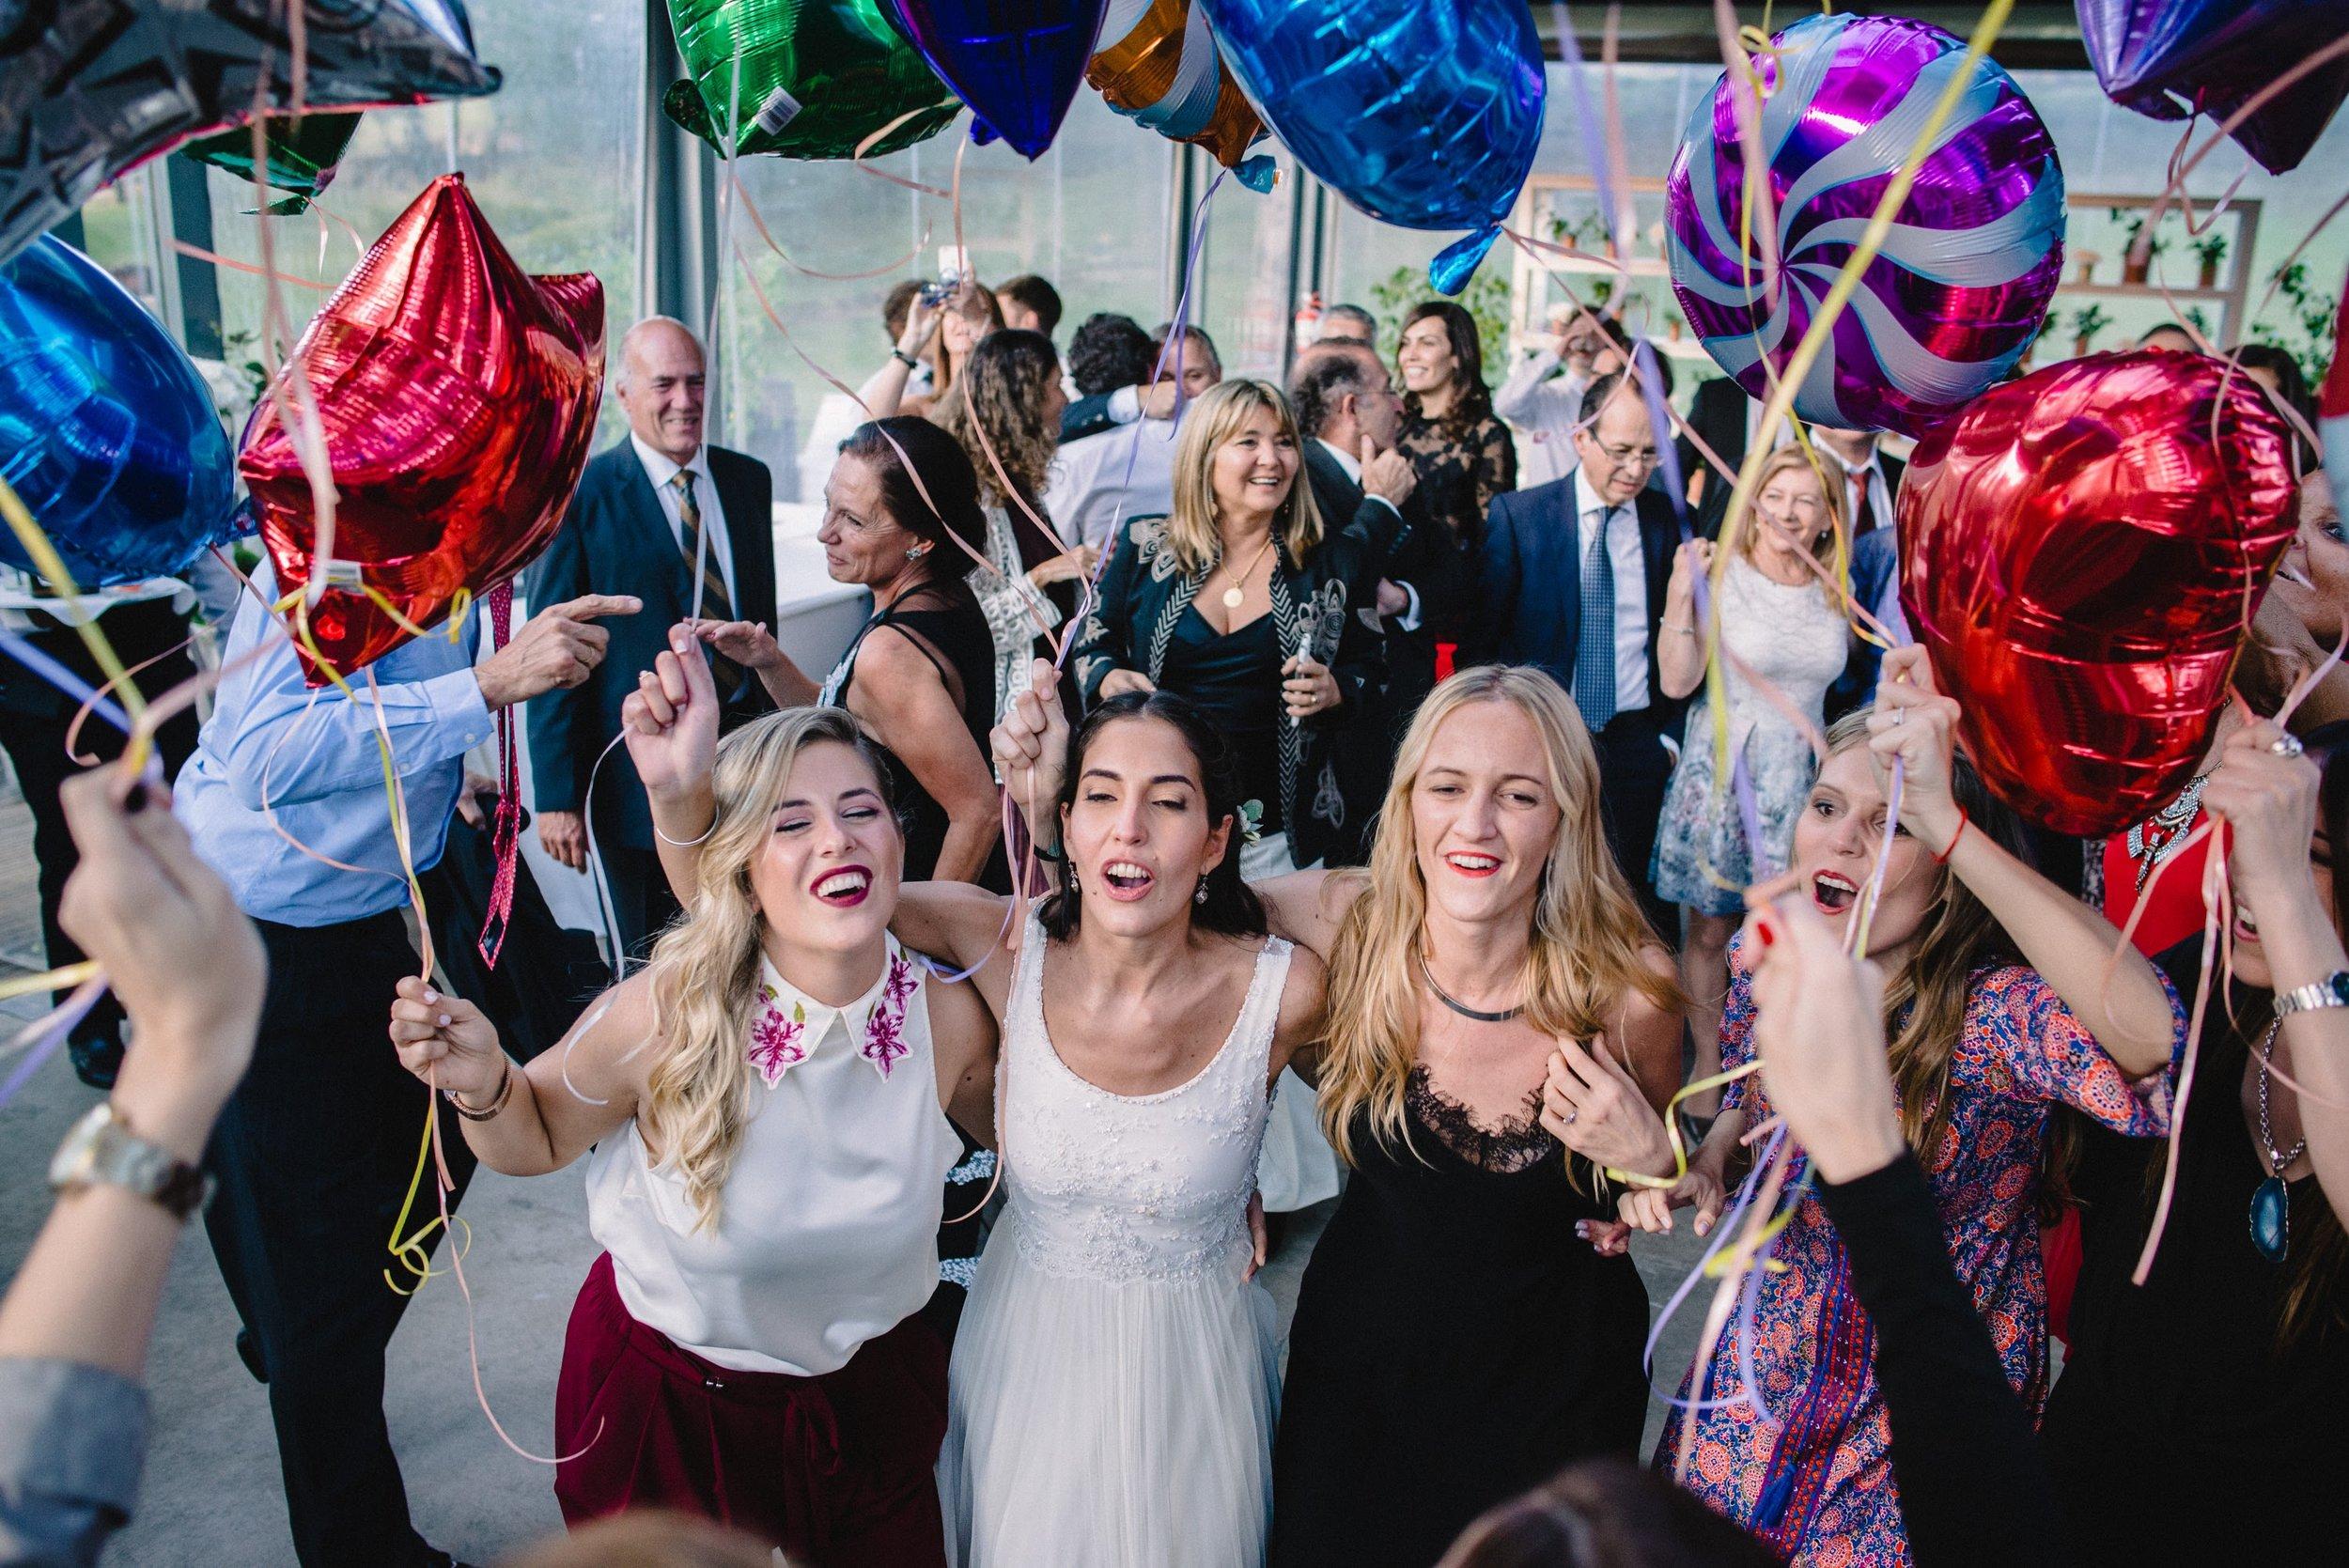 fotografo de bodas en carlos paz cordoba 073.JPG